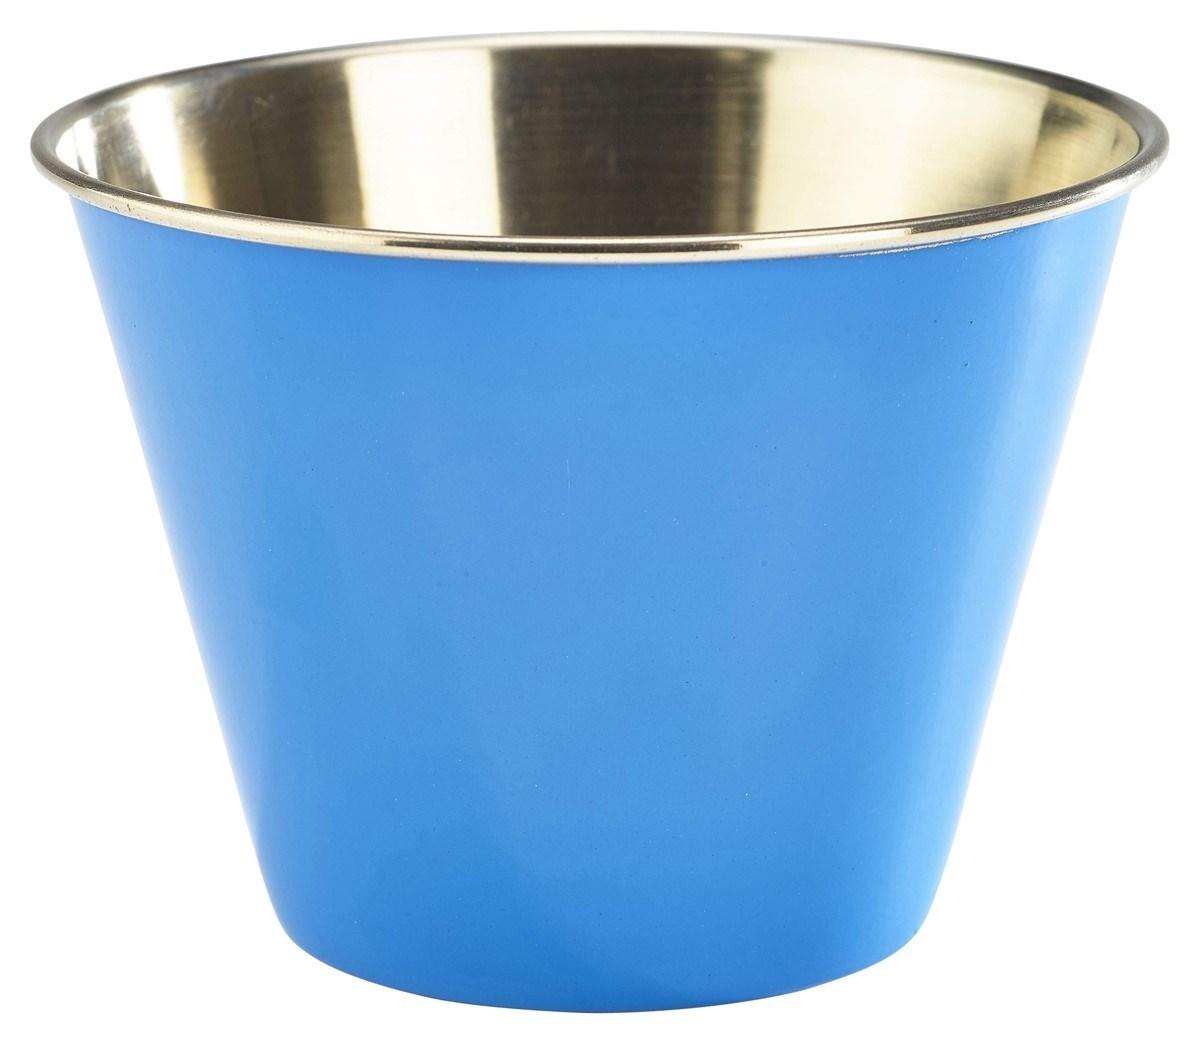 Productafbeelding RVS ramekin glad blauw 340 ml